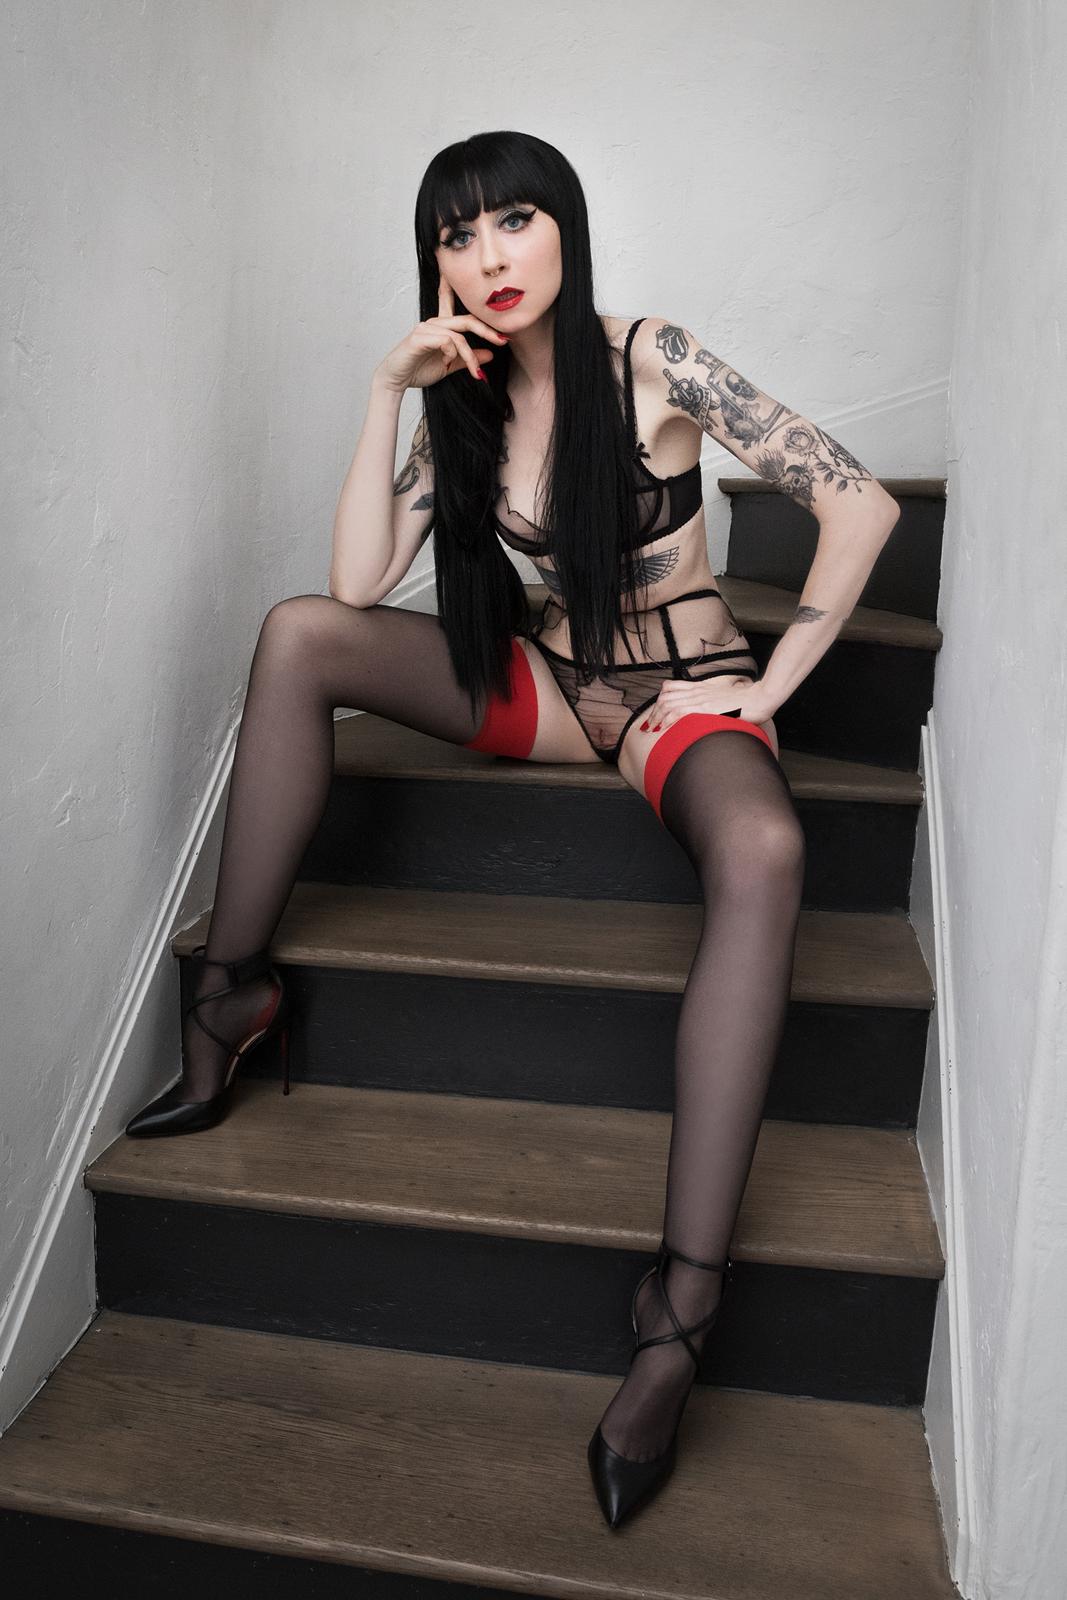 Ramona_Ryder_Companion_Escort_Model_GFE_NYC_Fly_Me_to_You_Stockings_10.jpg